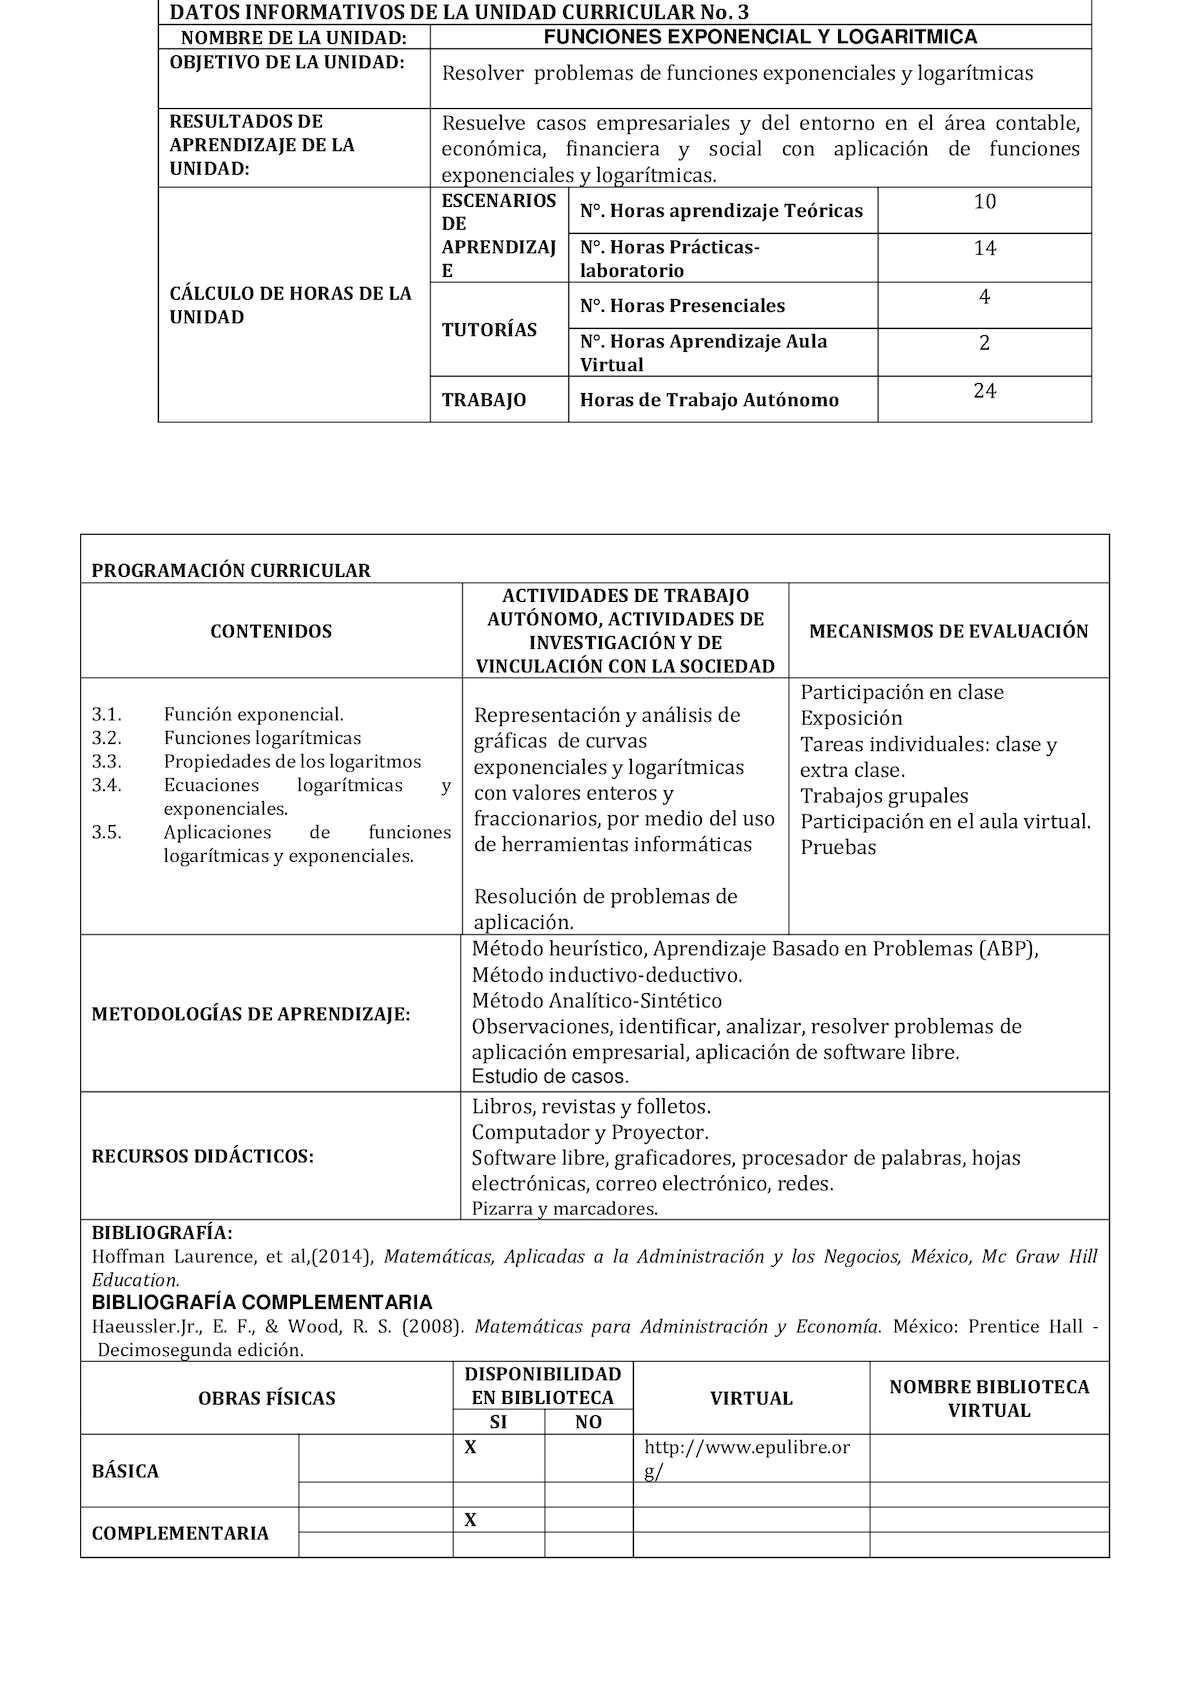 PORTAFOLIO MATEMATICA CA1.1 - CALAMEO Downloader